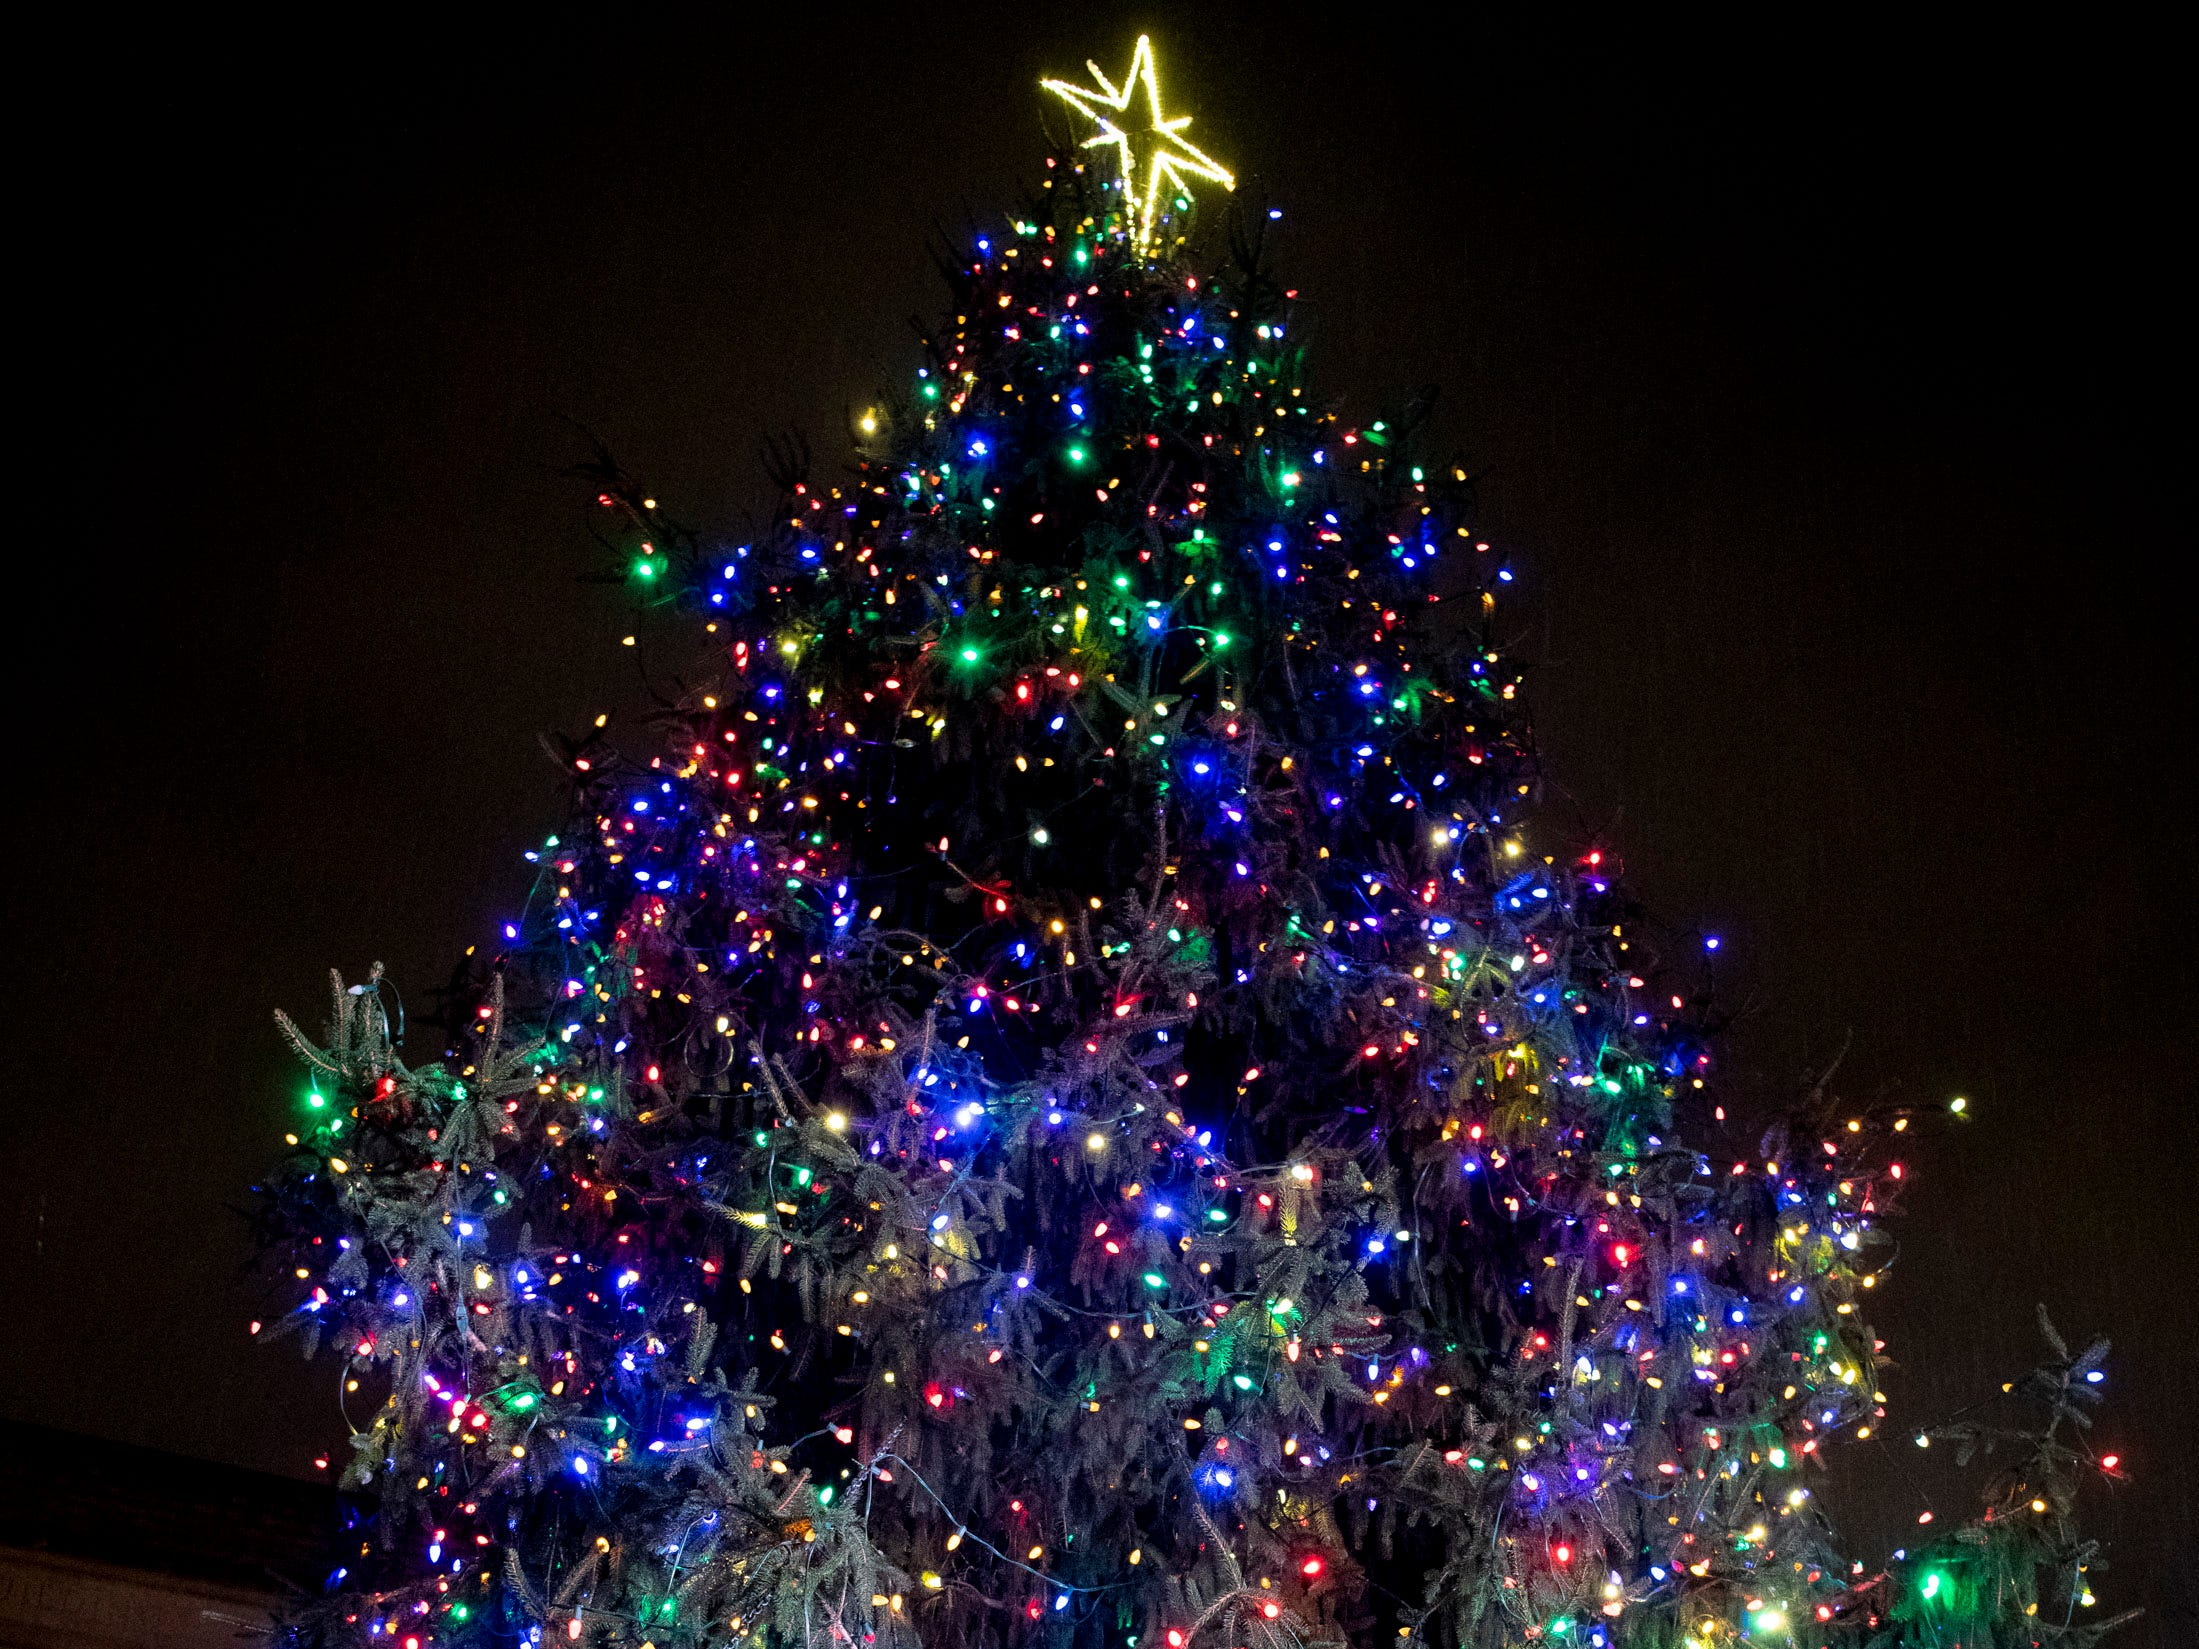 The lit tree during the Metro Nashville Christmas Tree Lighting event at Public Square Park in Nashville, Tenn., Friday, Nov. 30, 2018.